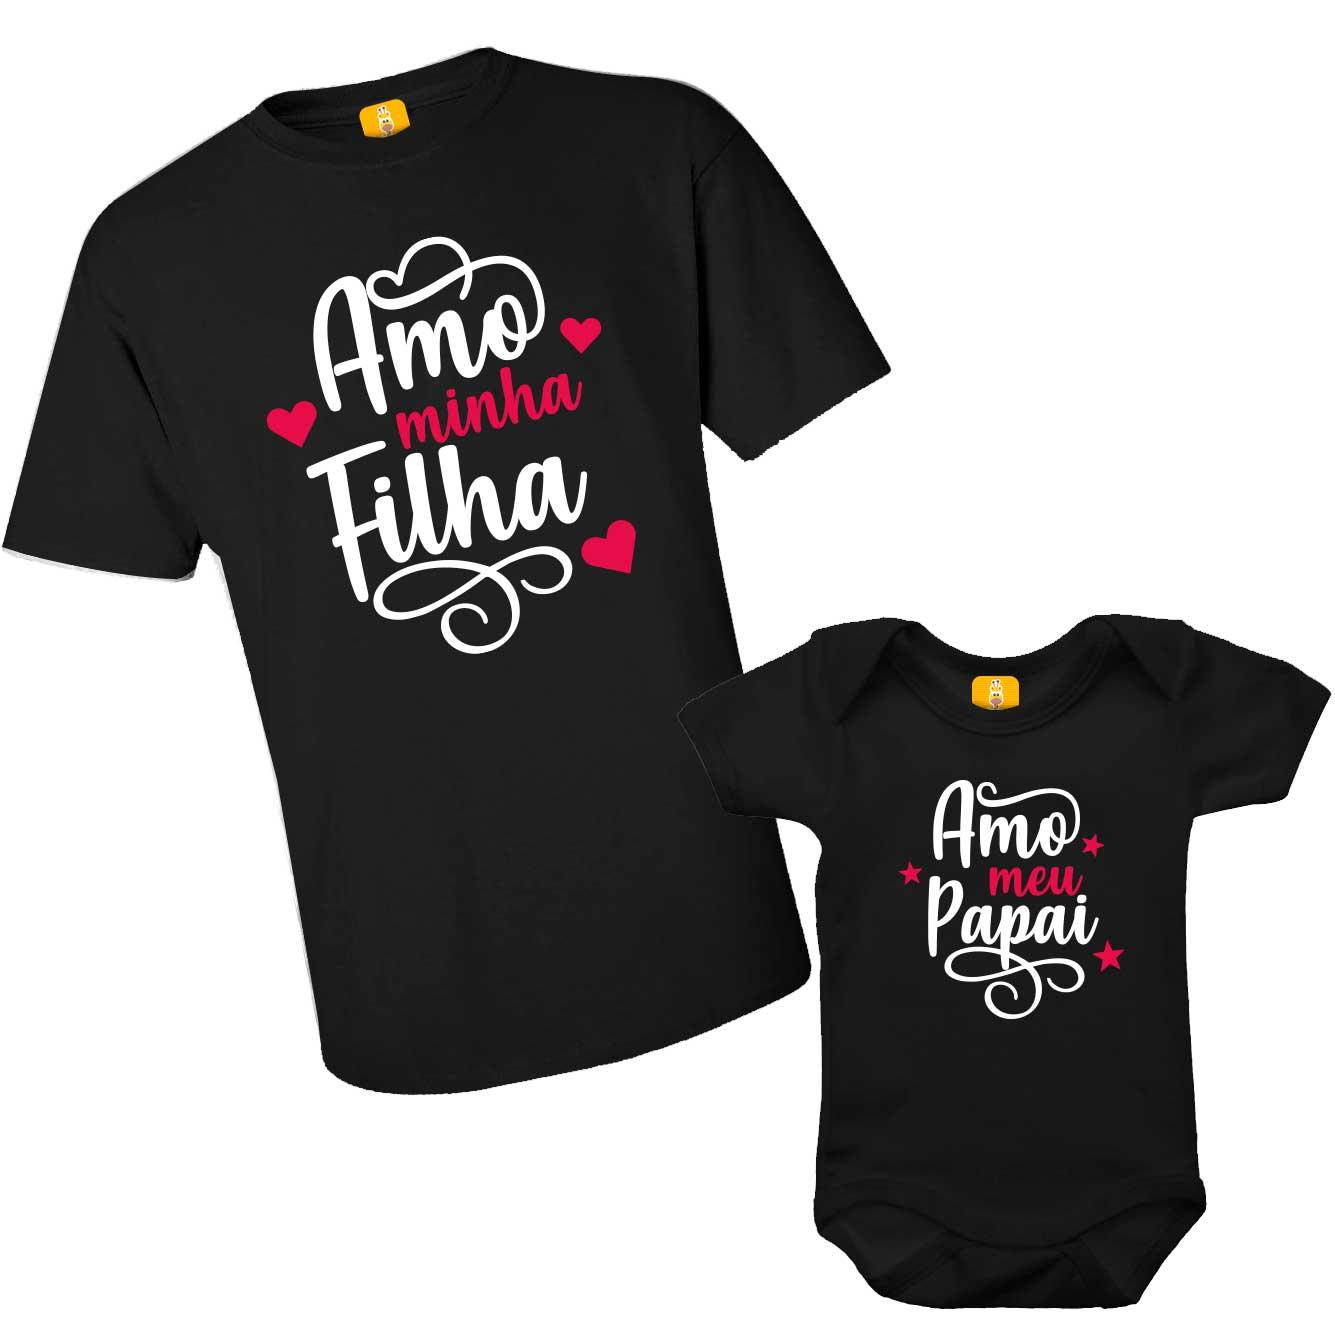 Kit Body e Camiseta - Tal Pai Tal Filho - Amo meu Papai - Preto